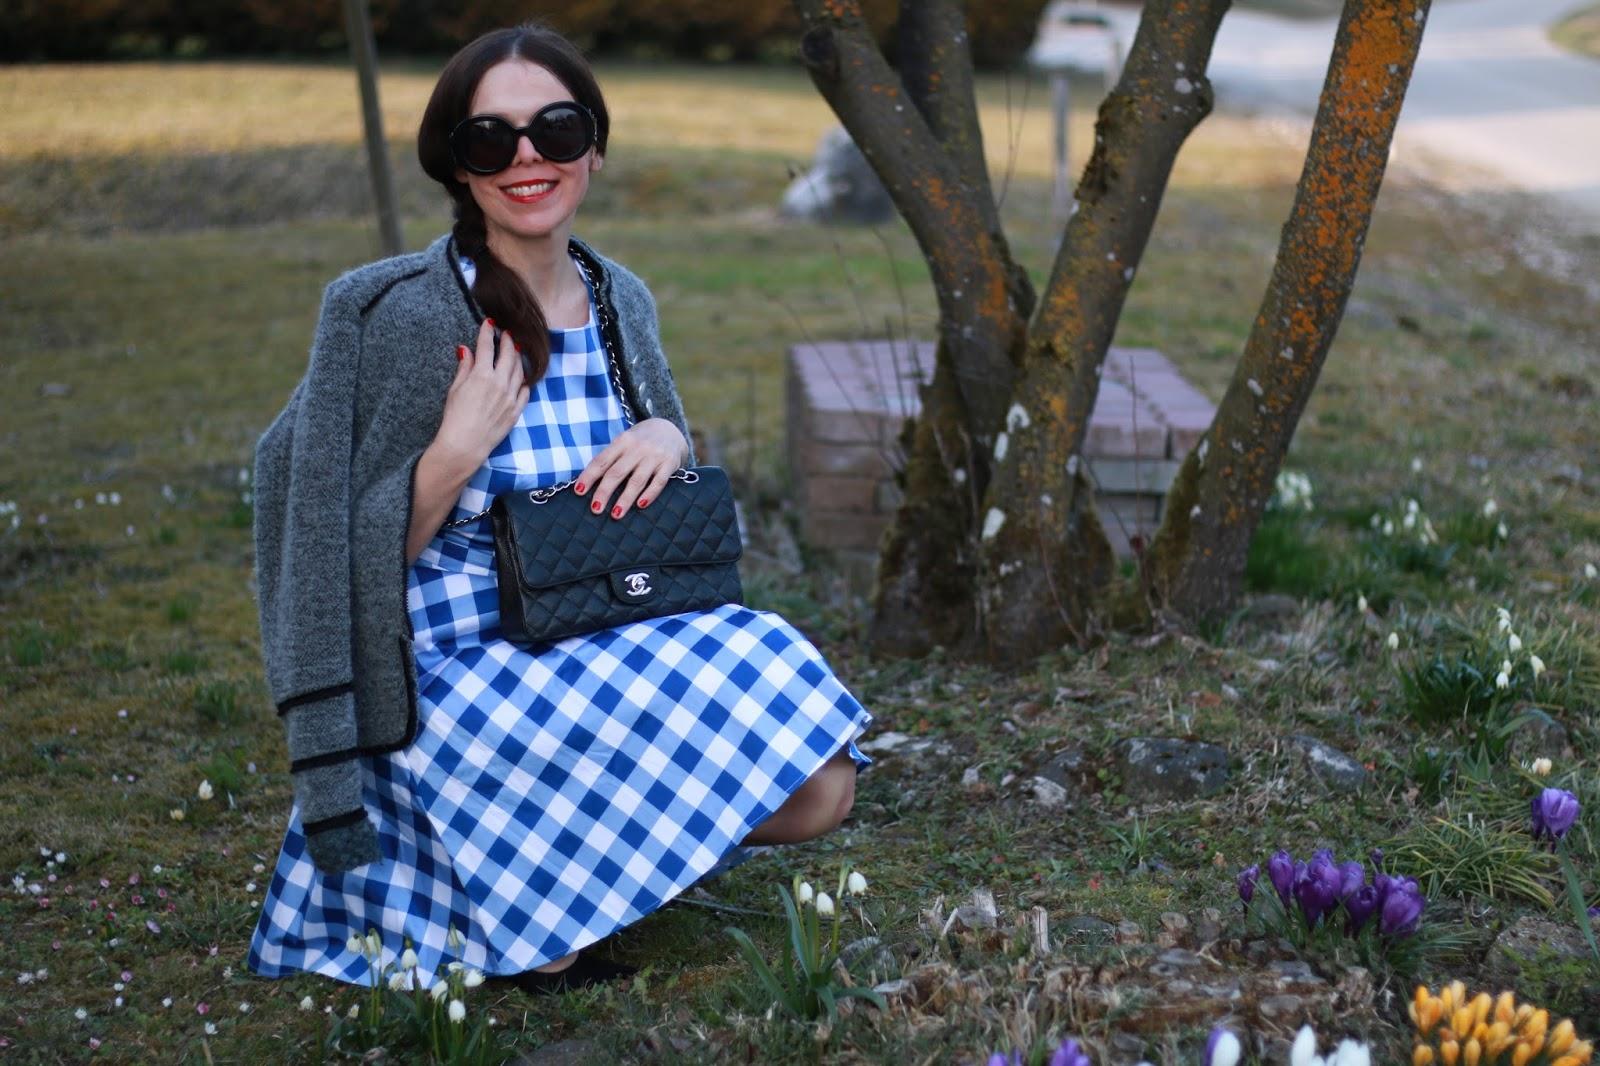 Look Chanel 2.55 black, gingham dress blue white, grey trachtenjanker, black suede block heels